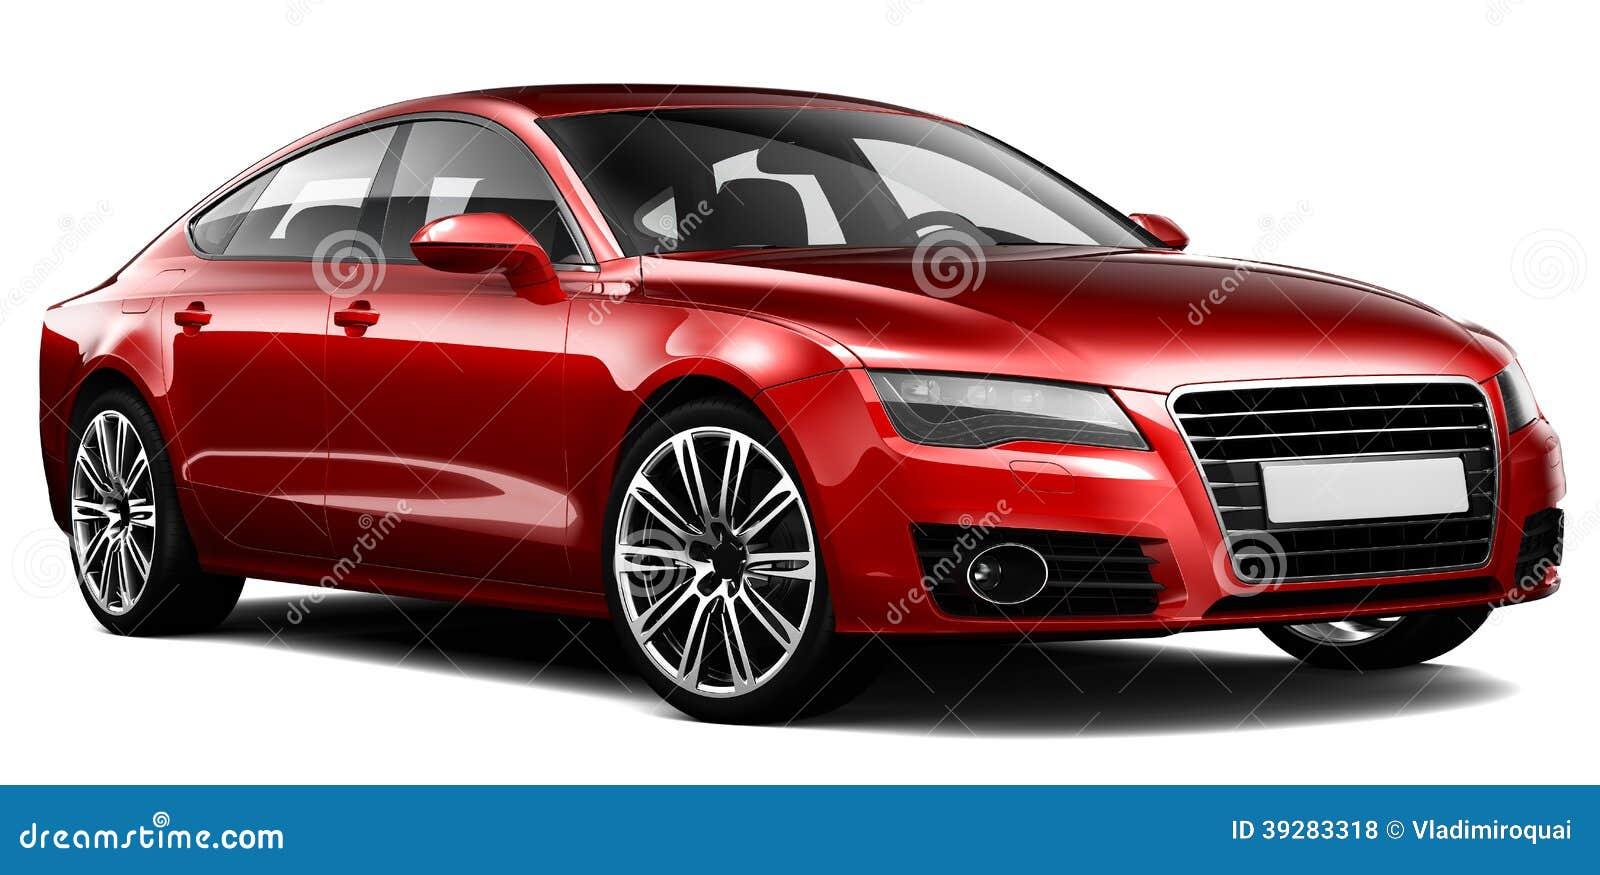 red luxury car stock illustration image of wallpaper. Black Bedroom Furniture Sets. Home Design Ideas